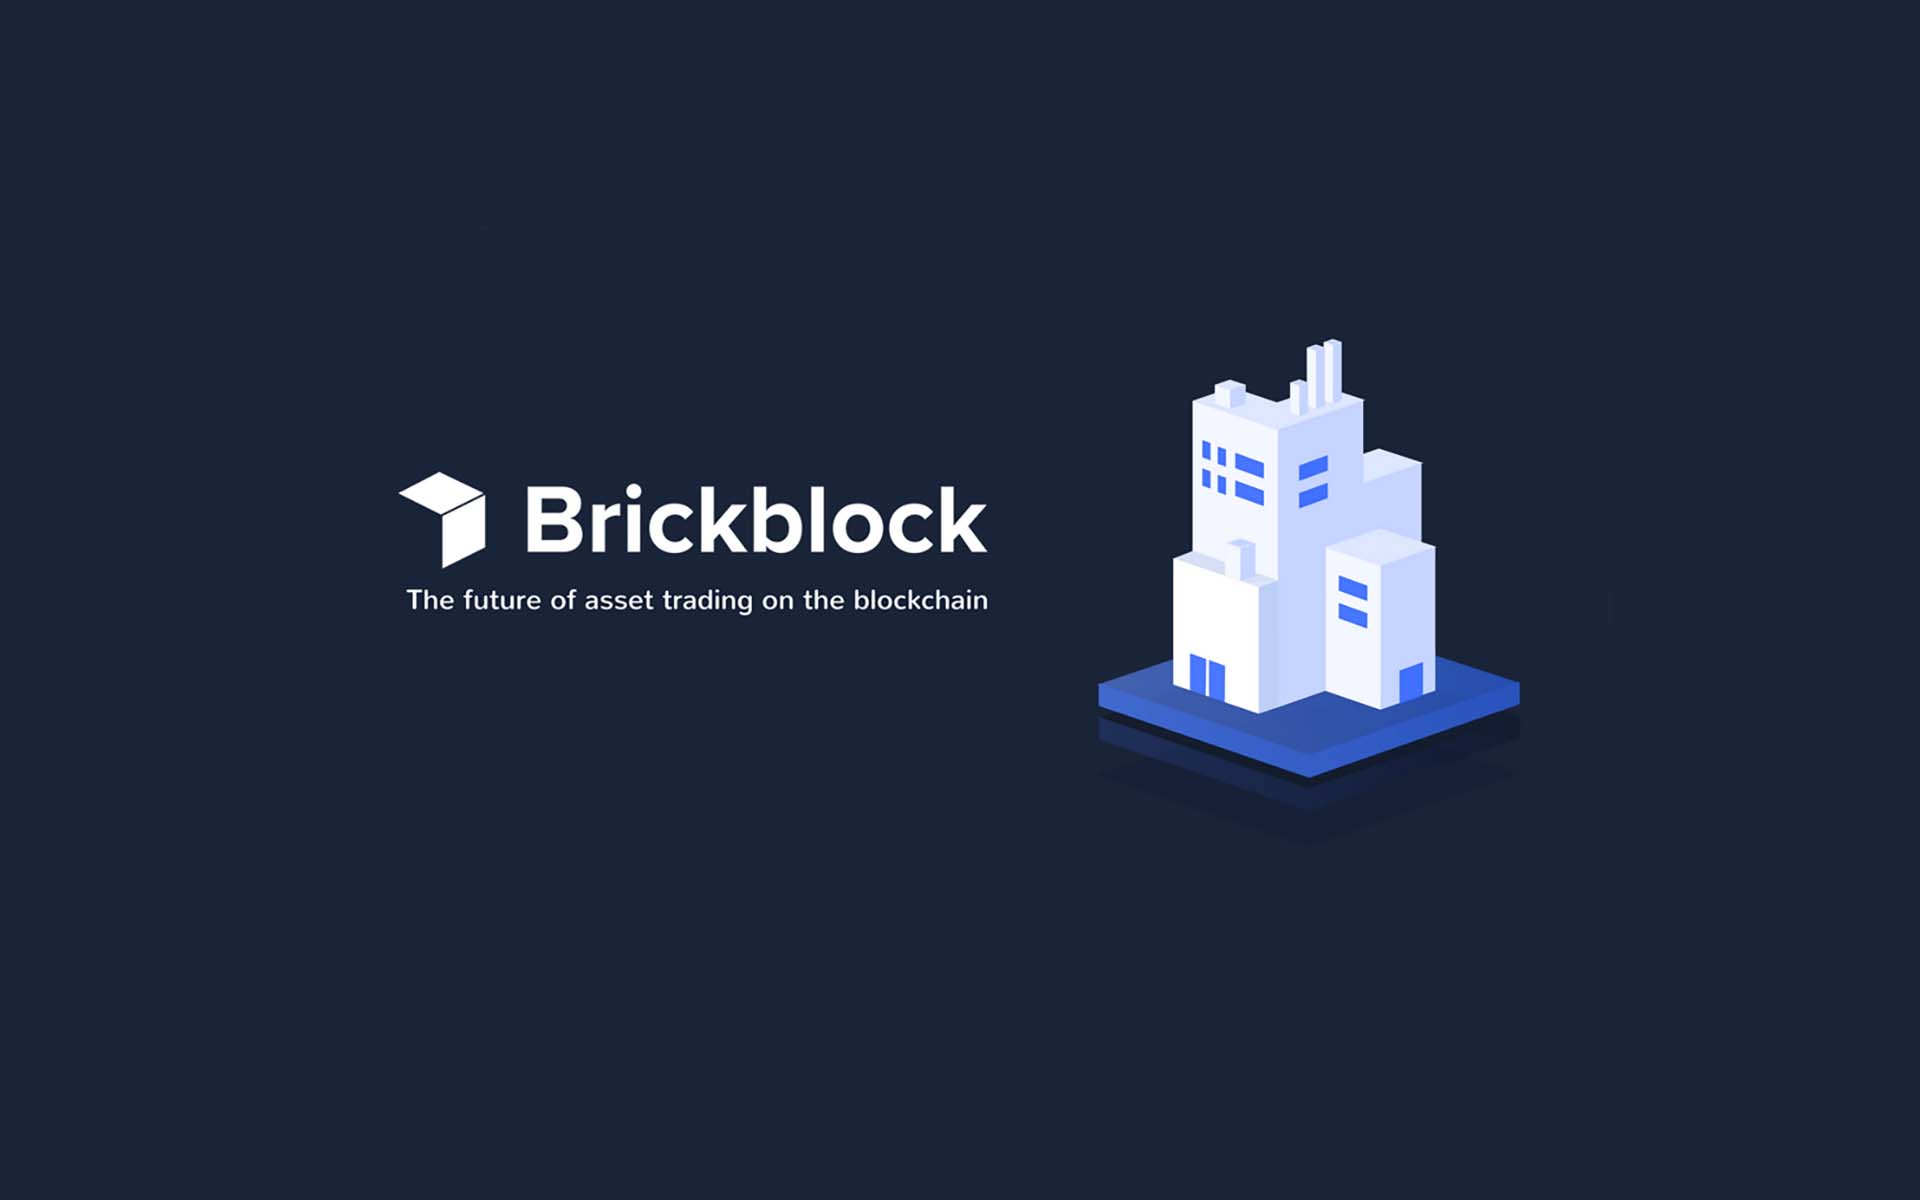 Brickblock ICO - Future of Asset Trading On the Blockchain Announces Token Sale